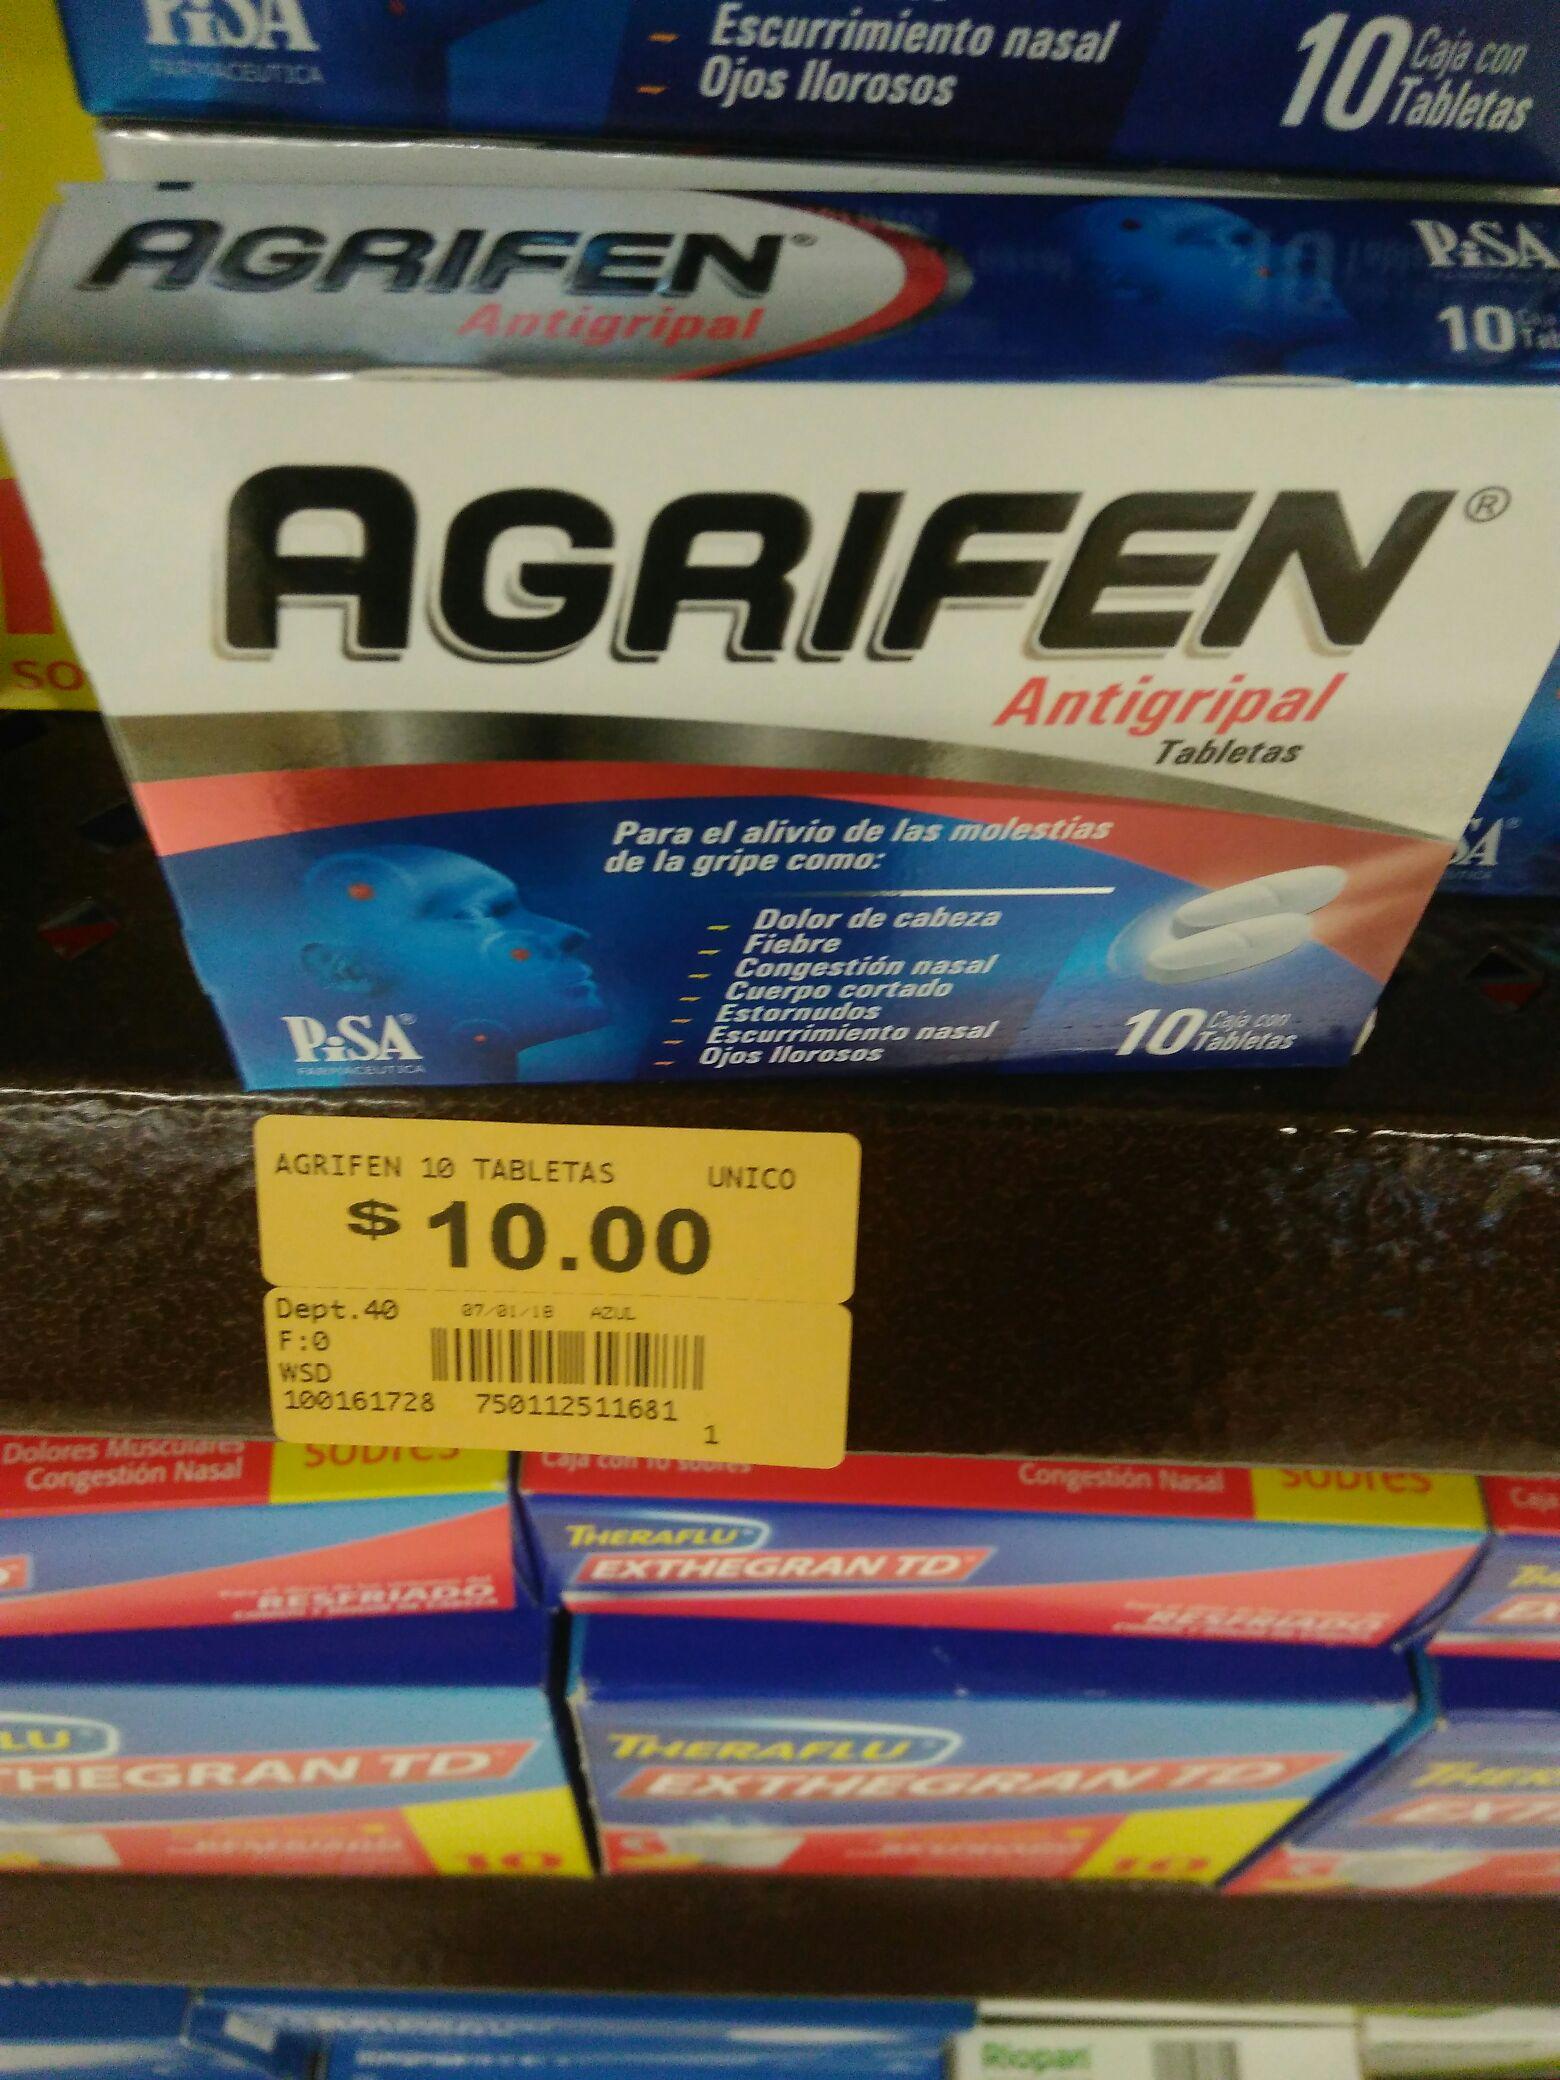 Superama Las Águilas CDMX: Agrifen antigripal a $10 pesos